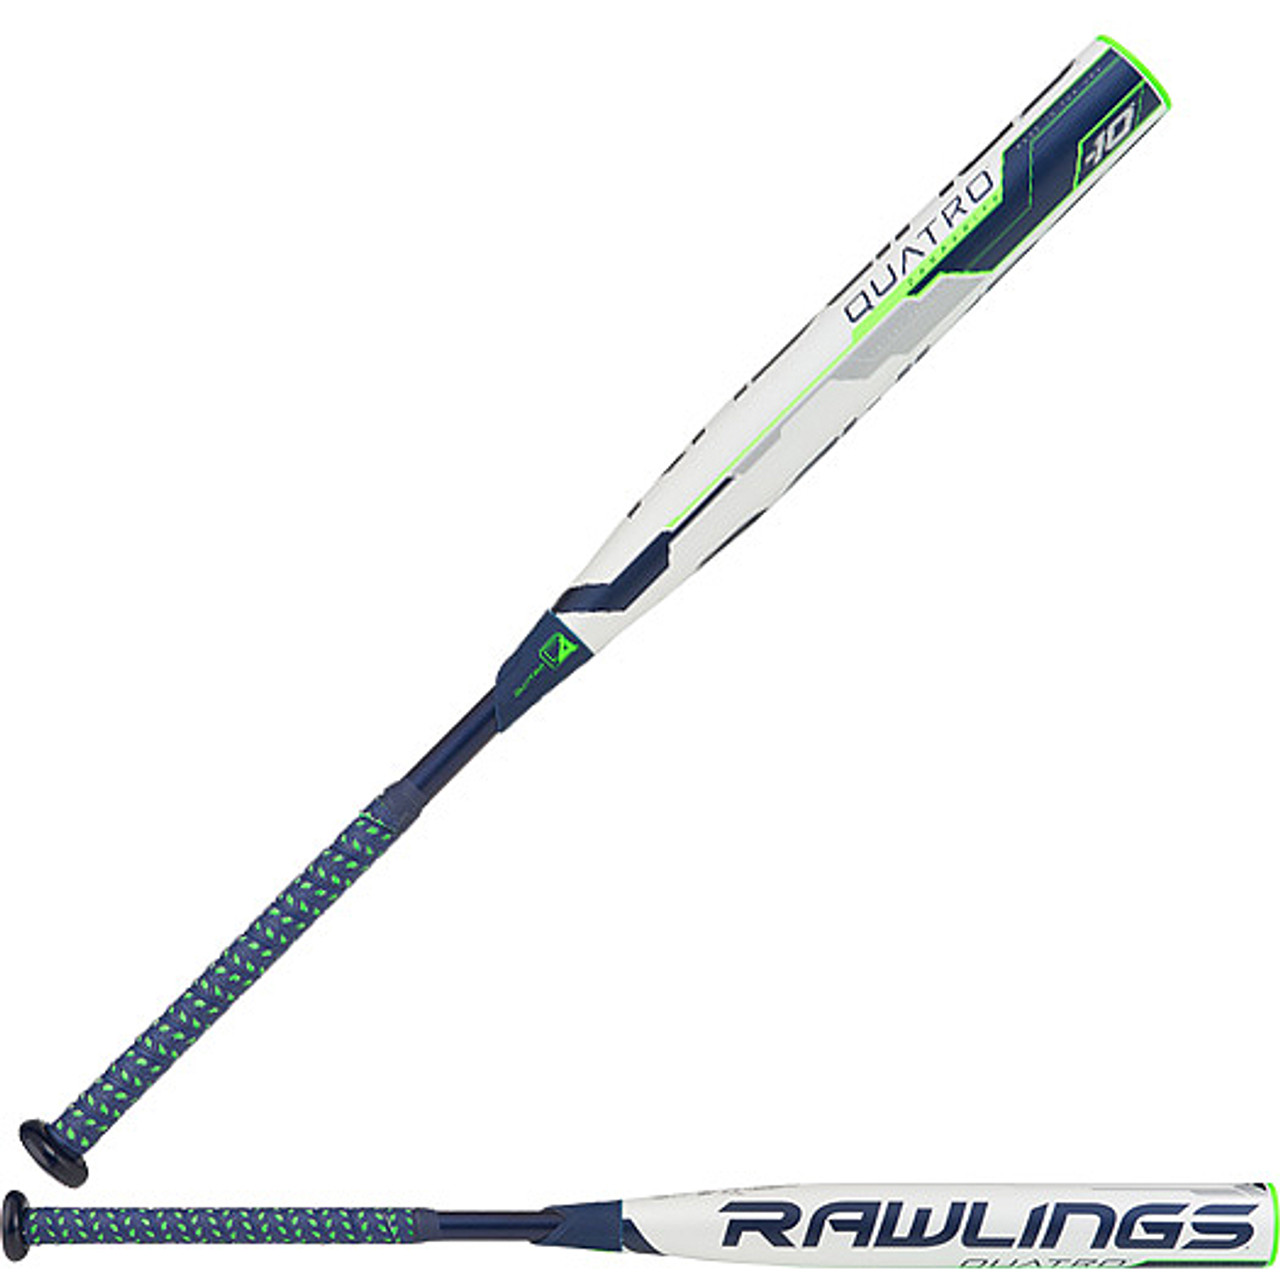 2018 Rawlings Quatro Pro Fastpitch Softball Bat FPQP10